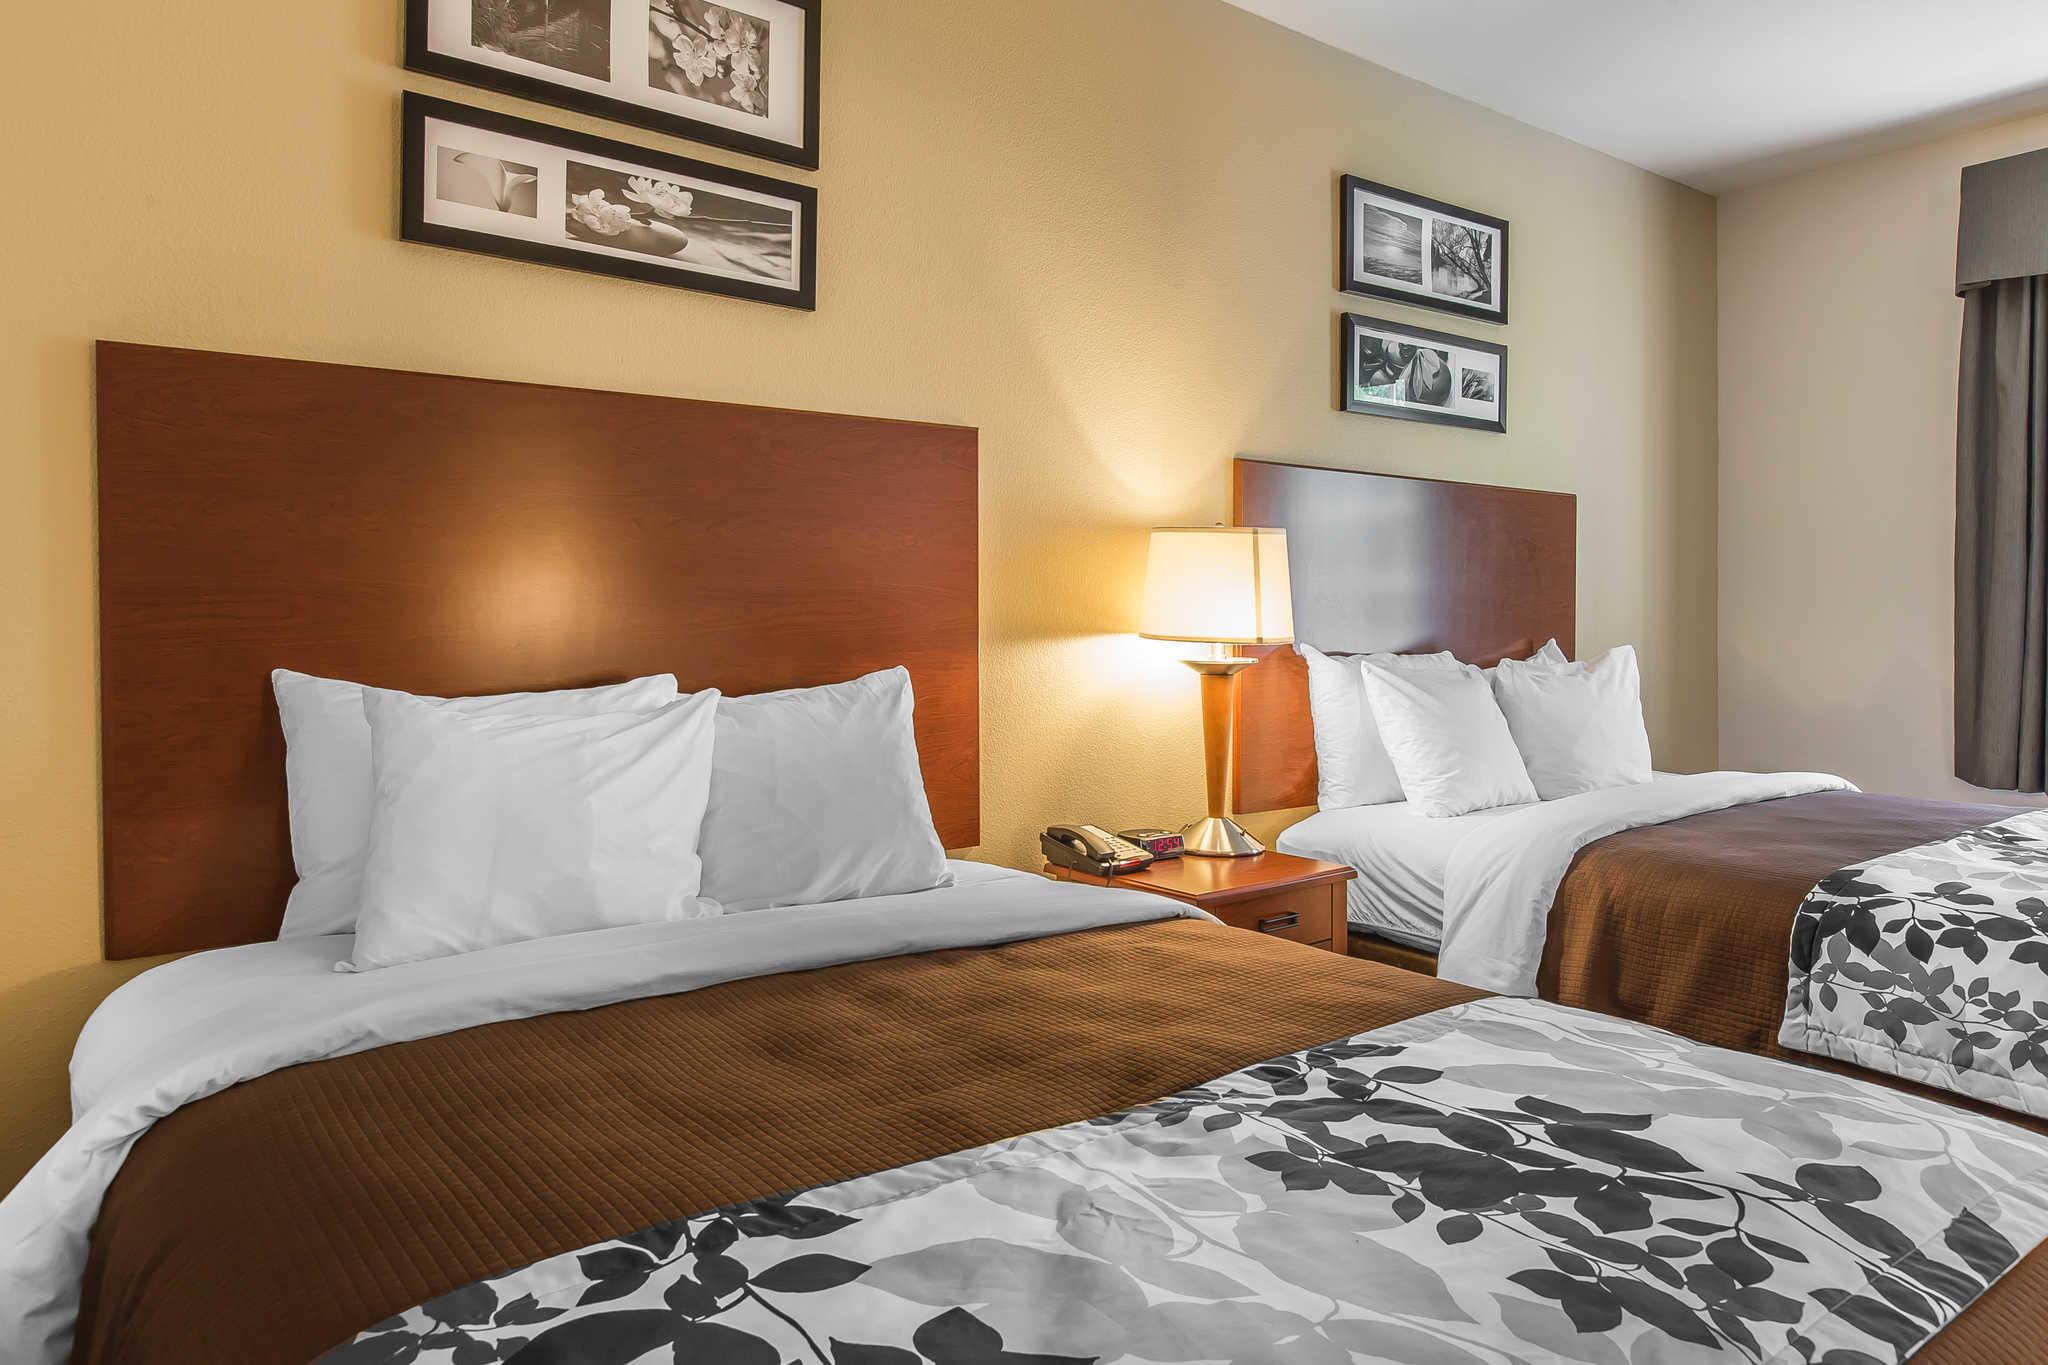 Sleep Inn & Suites At Kennesaw State University image 17